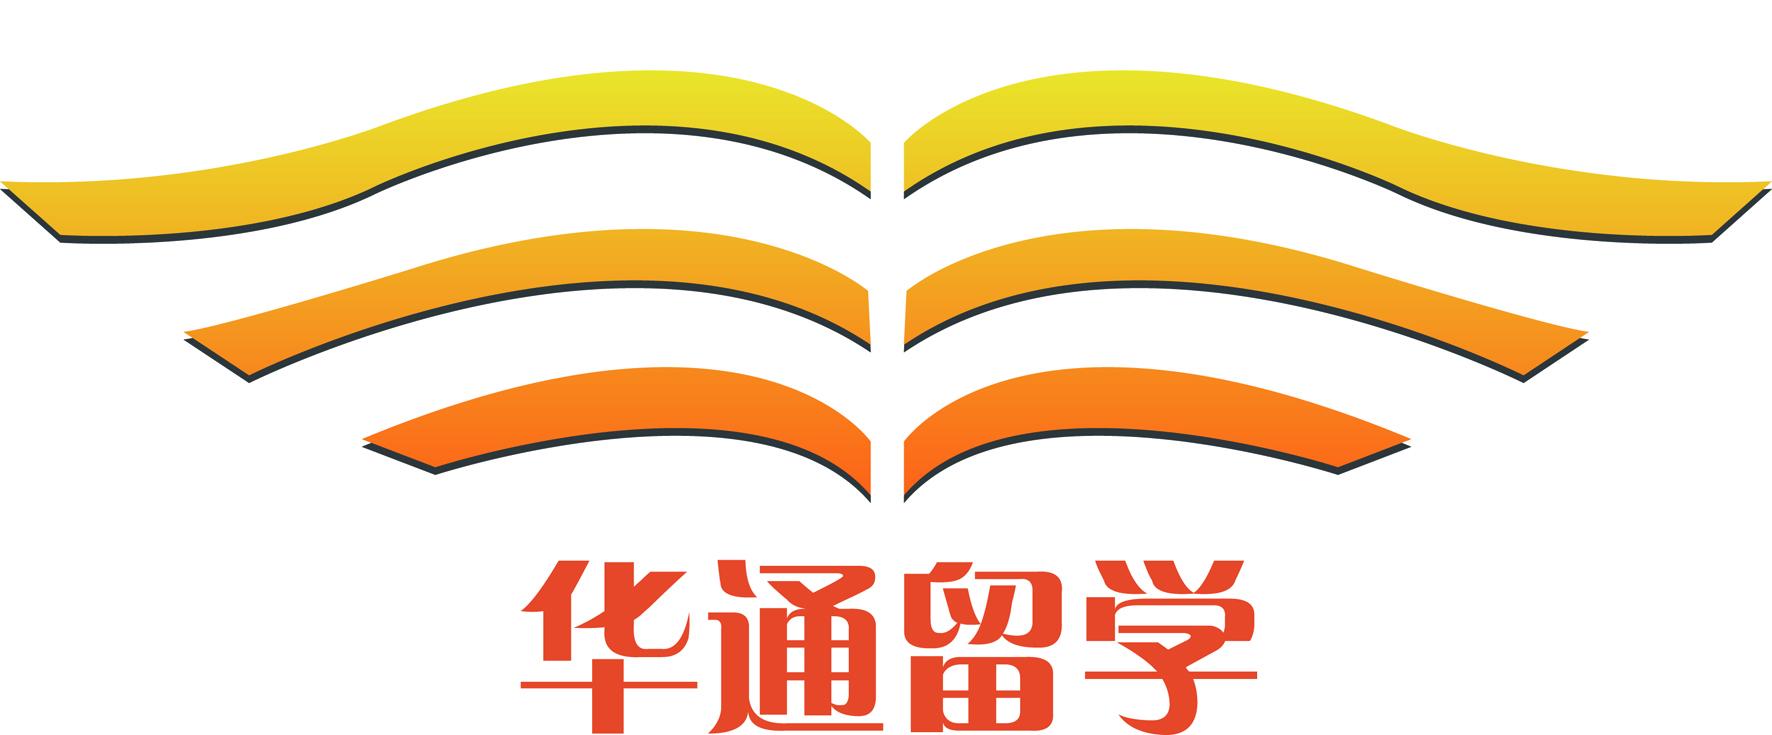 Logo Agents IAE China.jpg